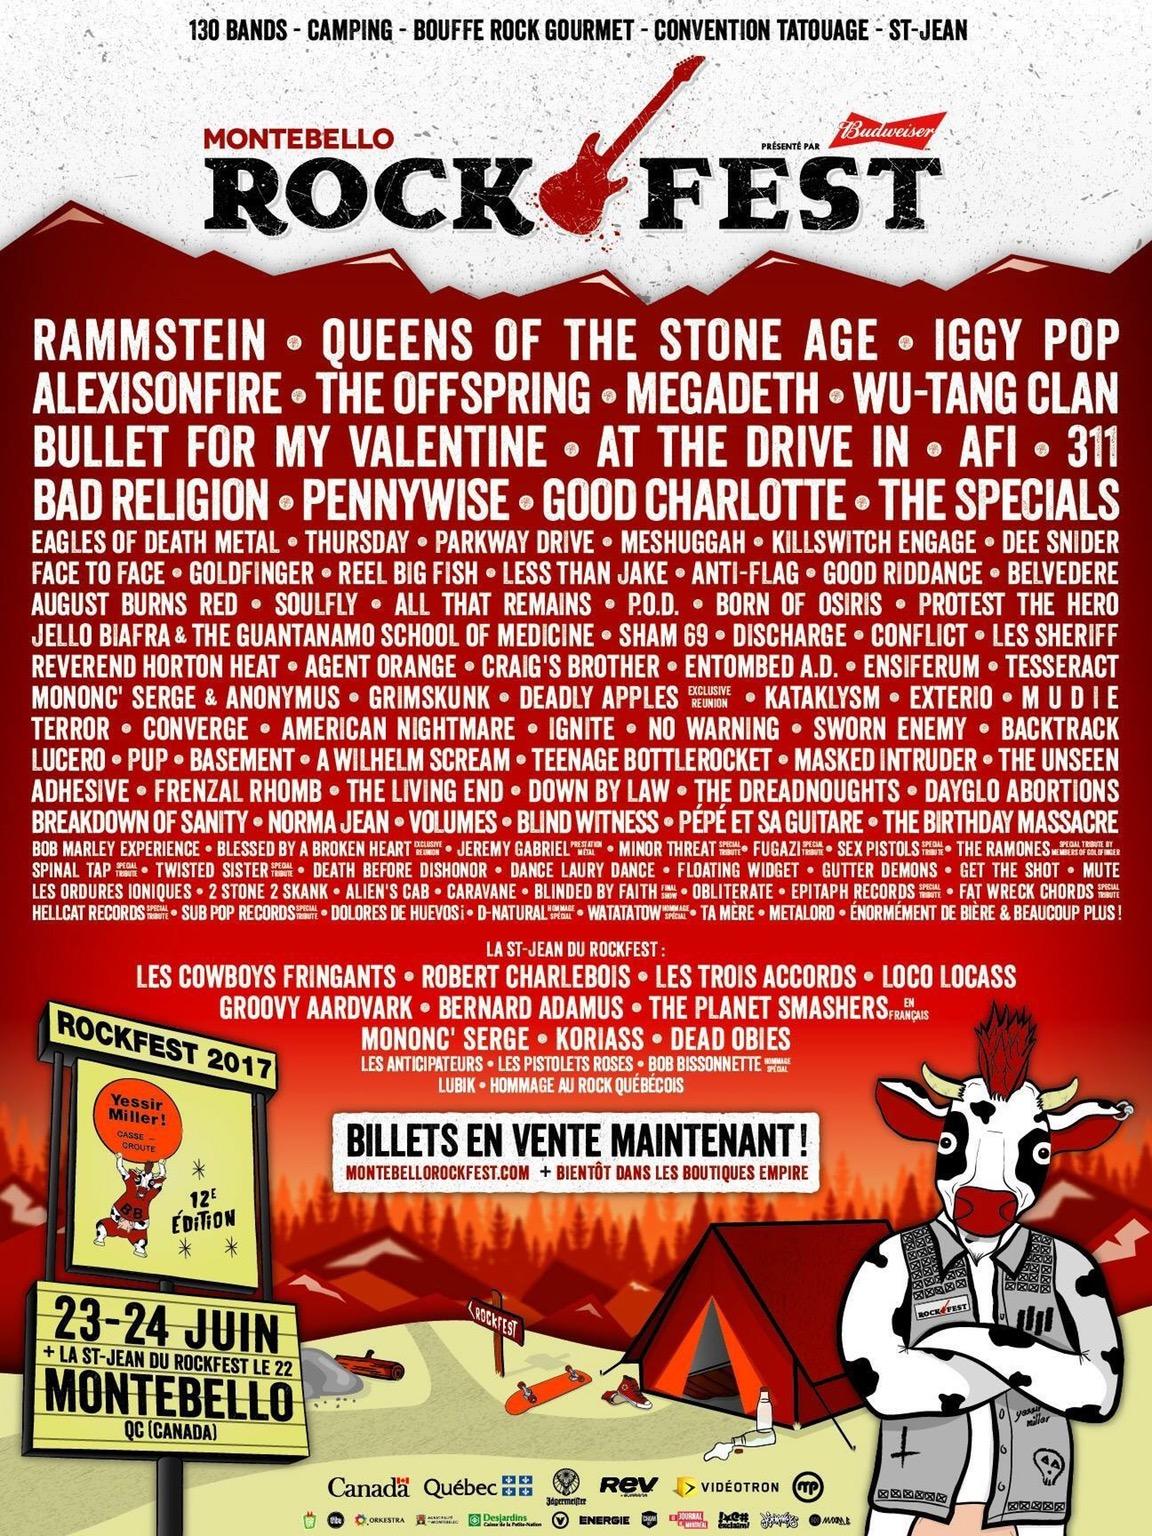 Montebello Rockfest reveals 2017 lineup: Rammstein, QOTSA, Iggy Pop to headline